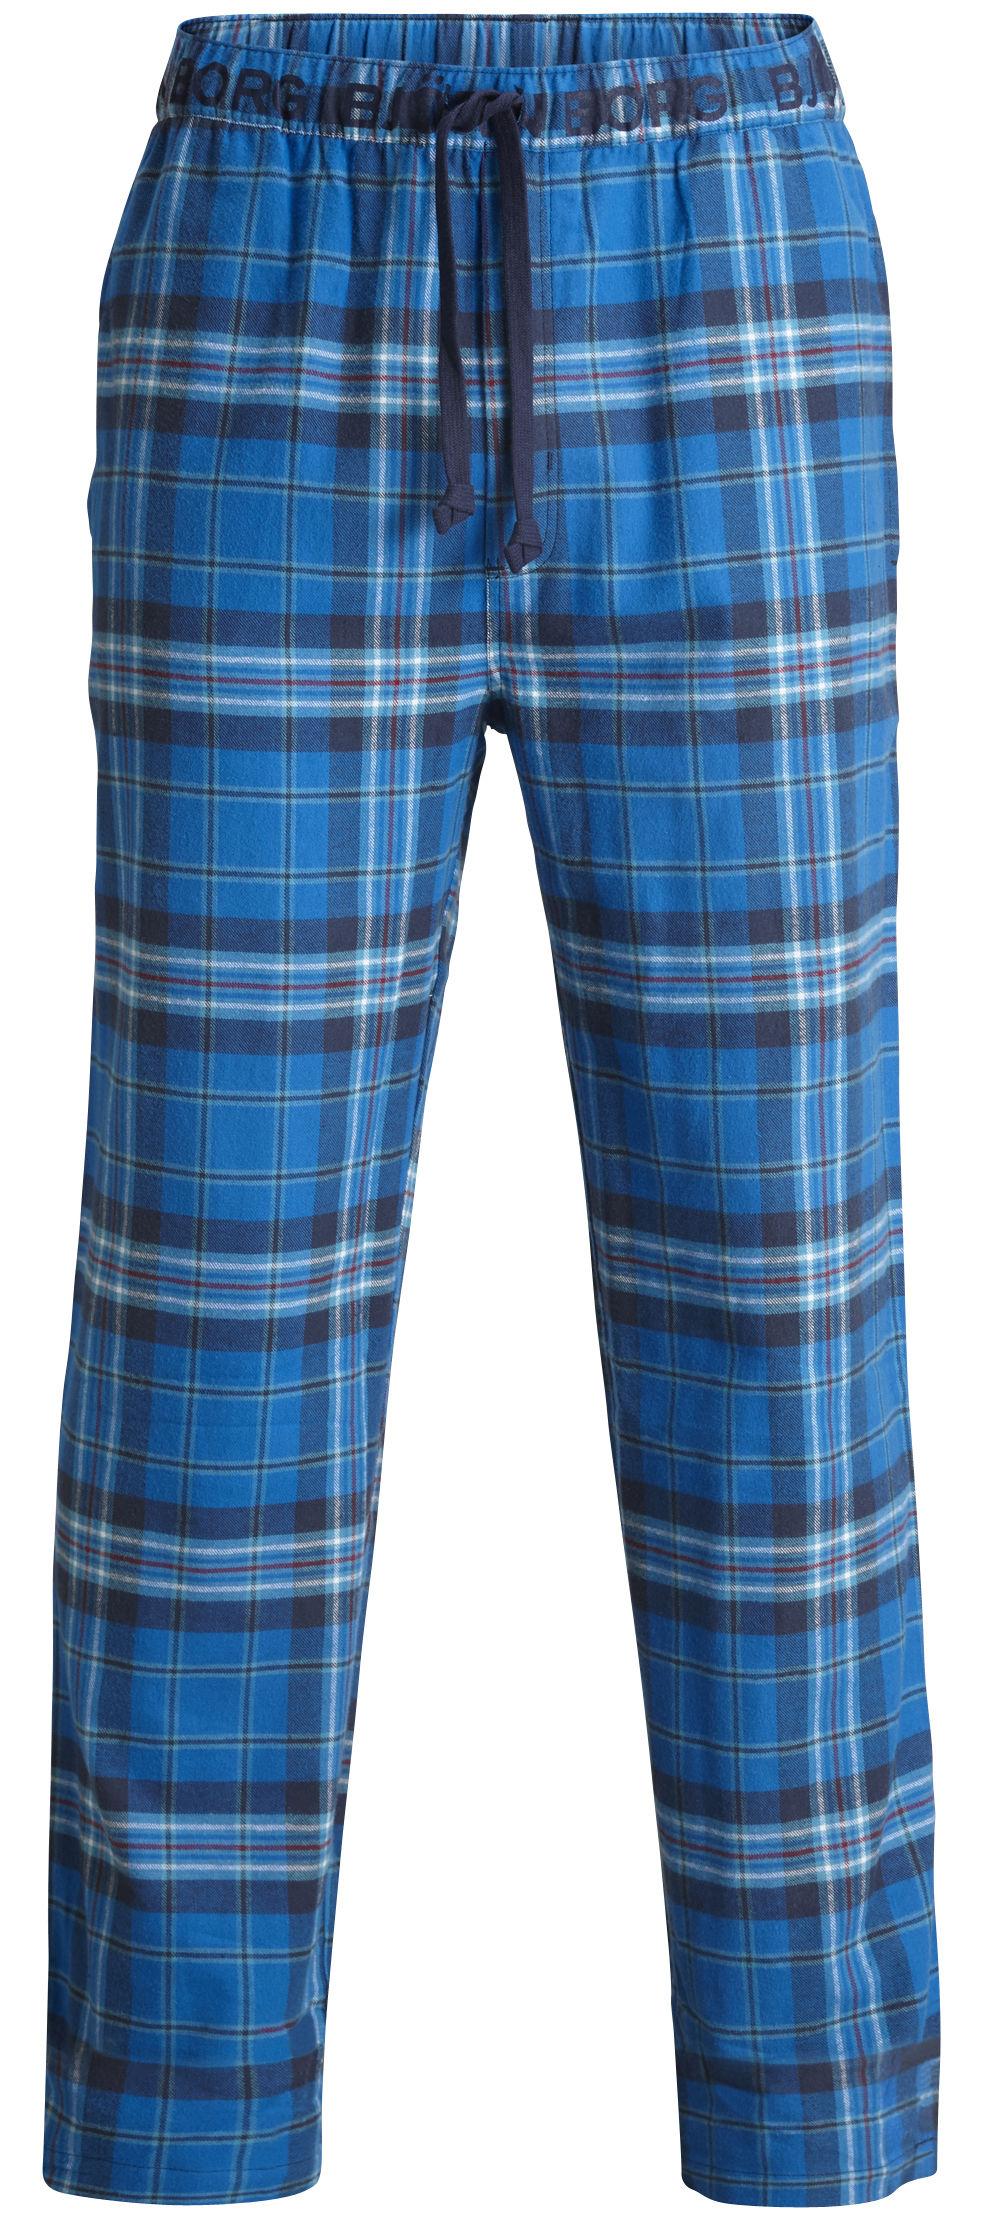 Björn Borg Knights Check miesten pyjama housut Sininen 60884ec243